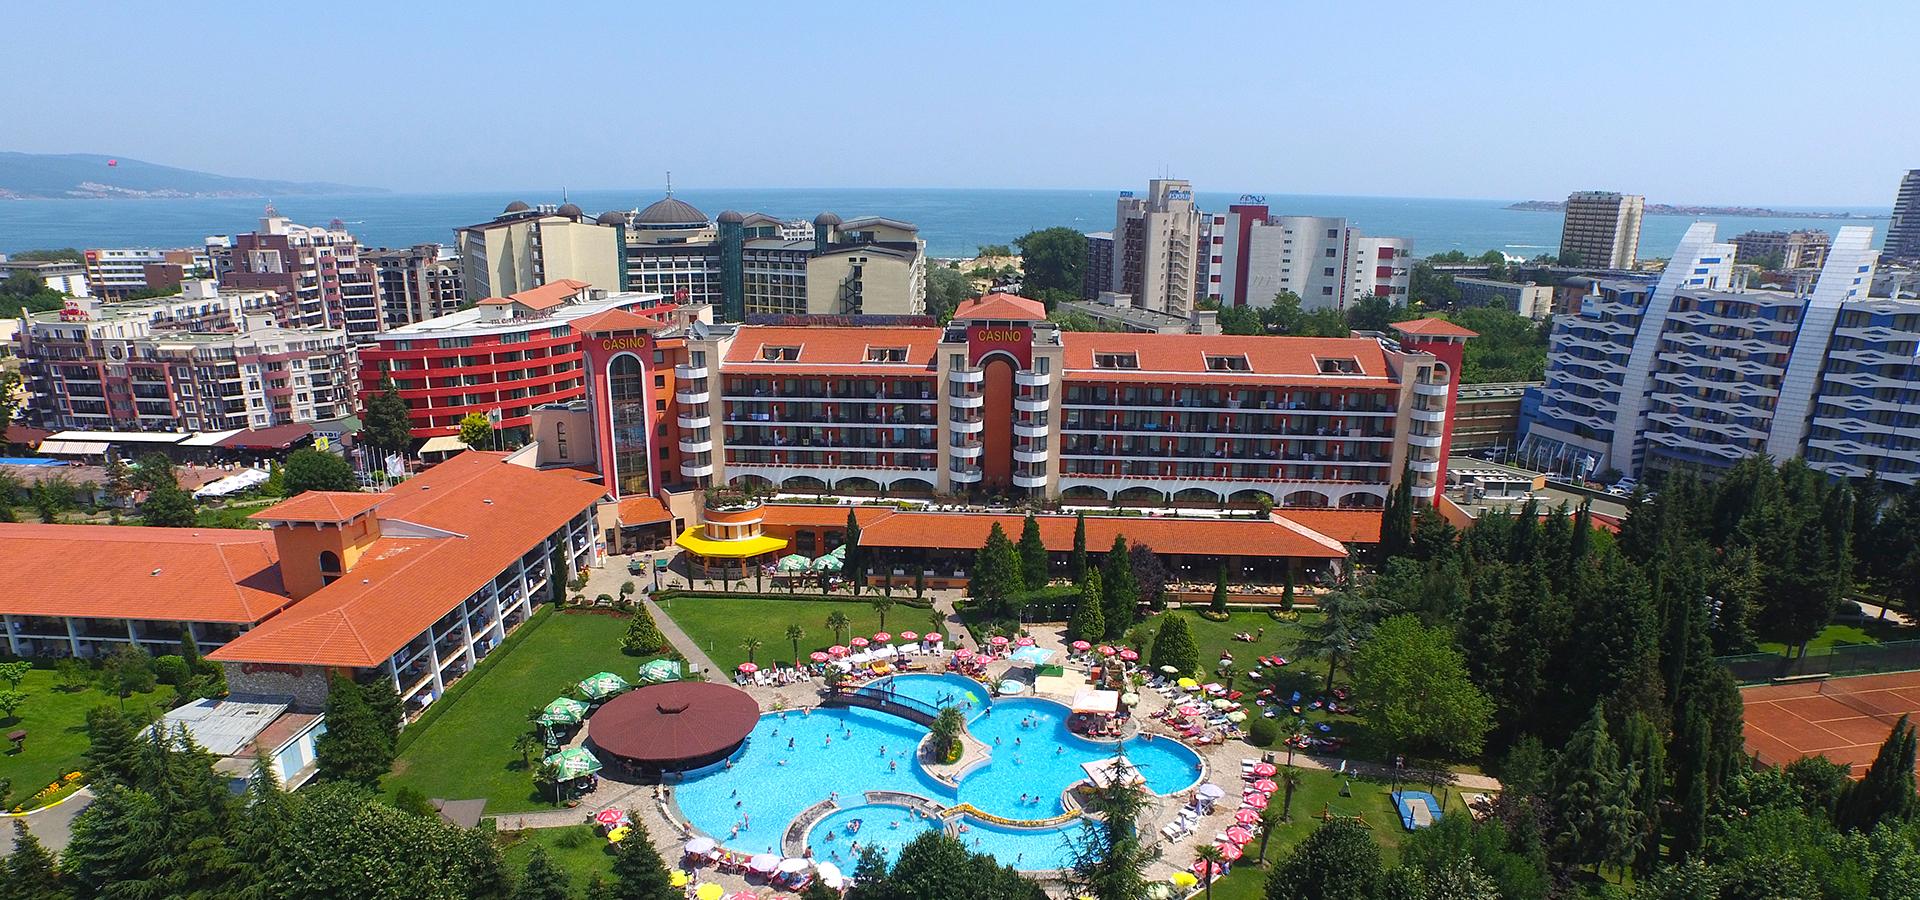 Sunny Beach Hotel Holdings